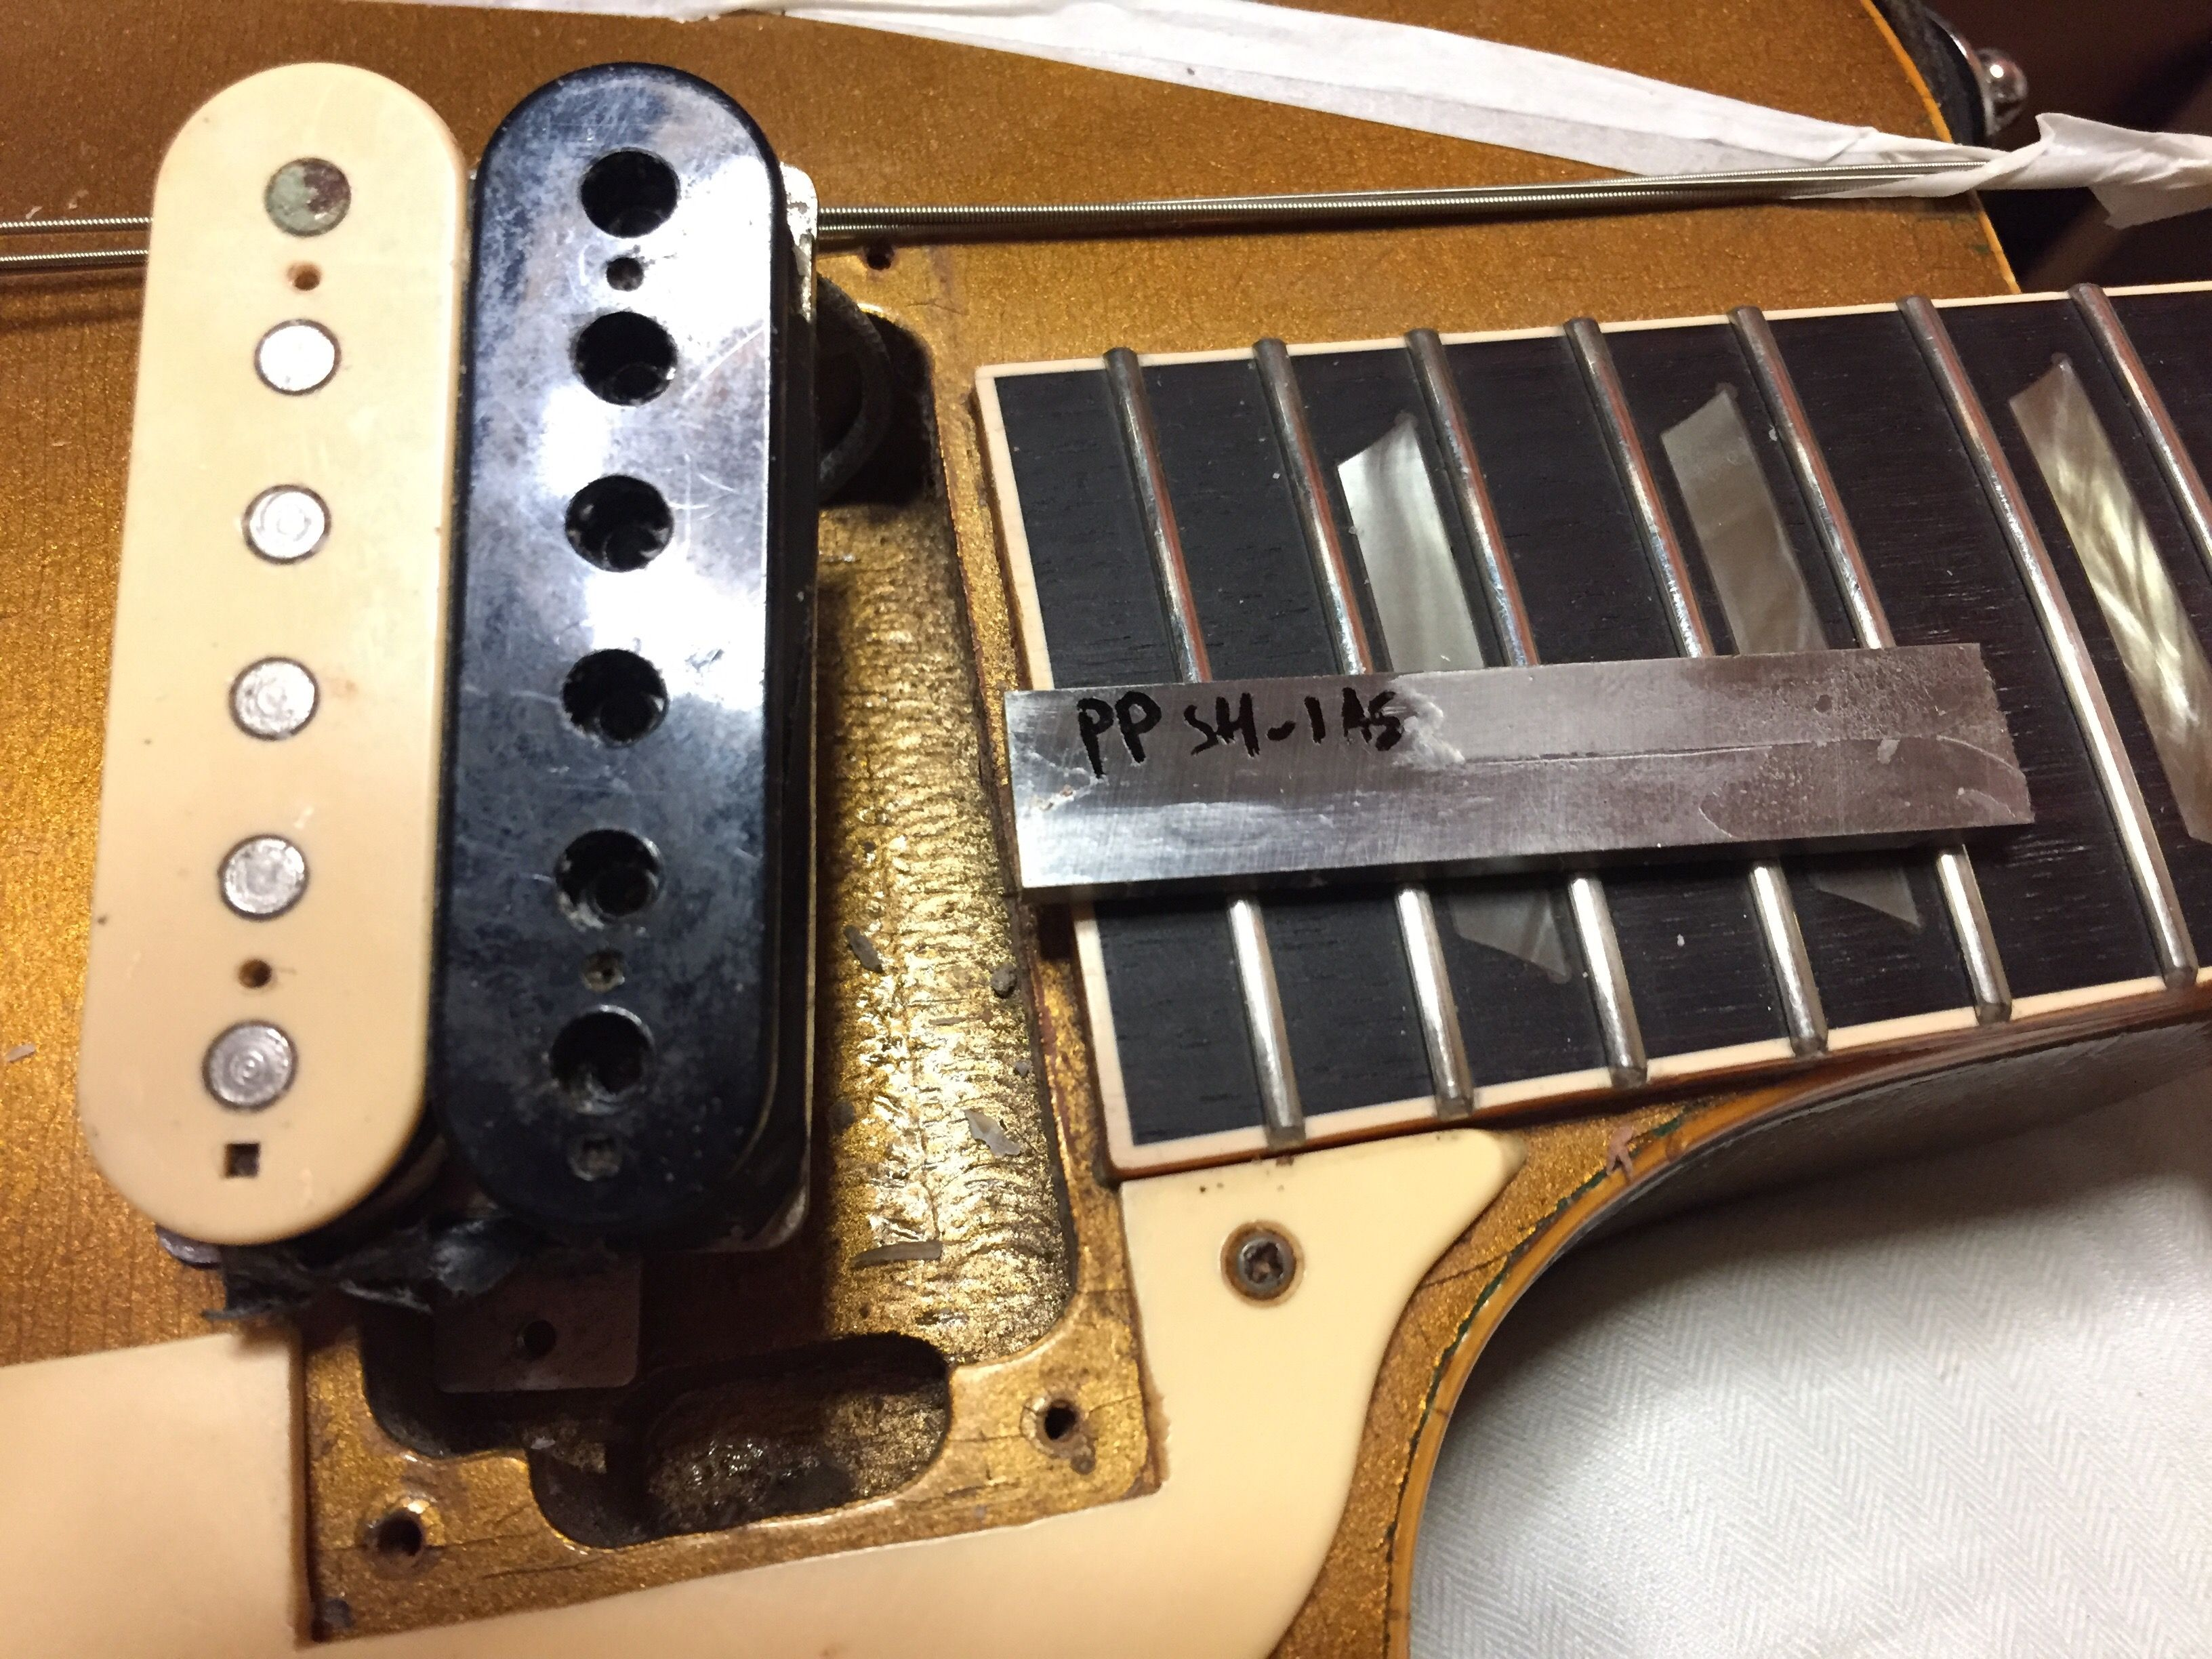 Seymour Duncan SH-1n 59\' a5 | paf clones | Pinterest | A5, Guitars ...